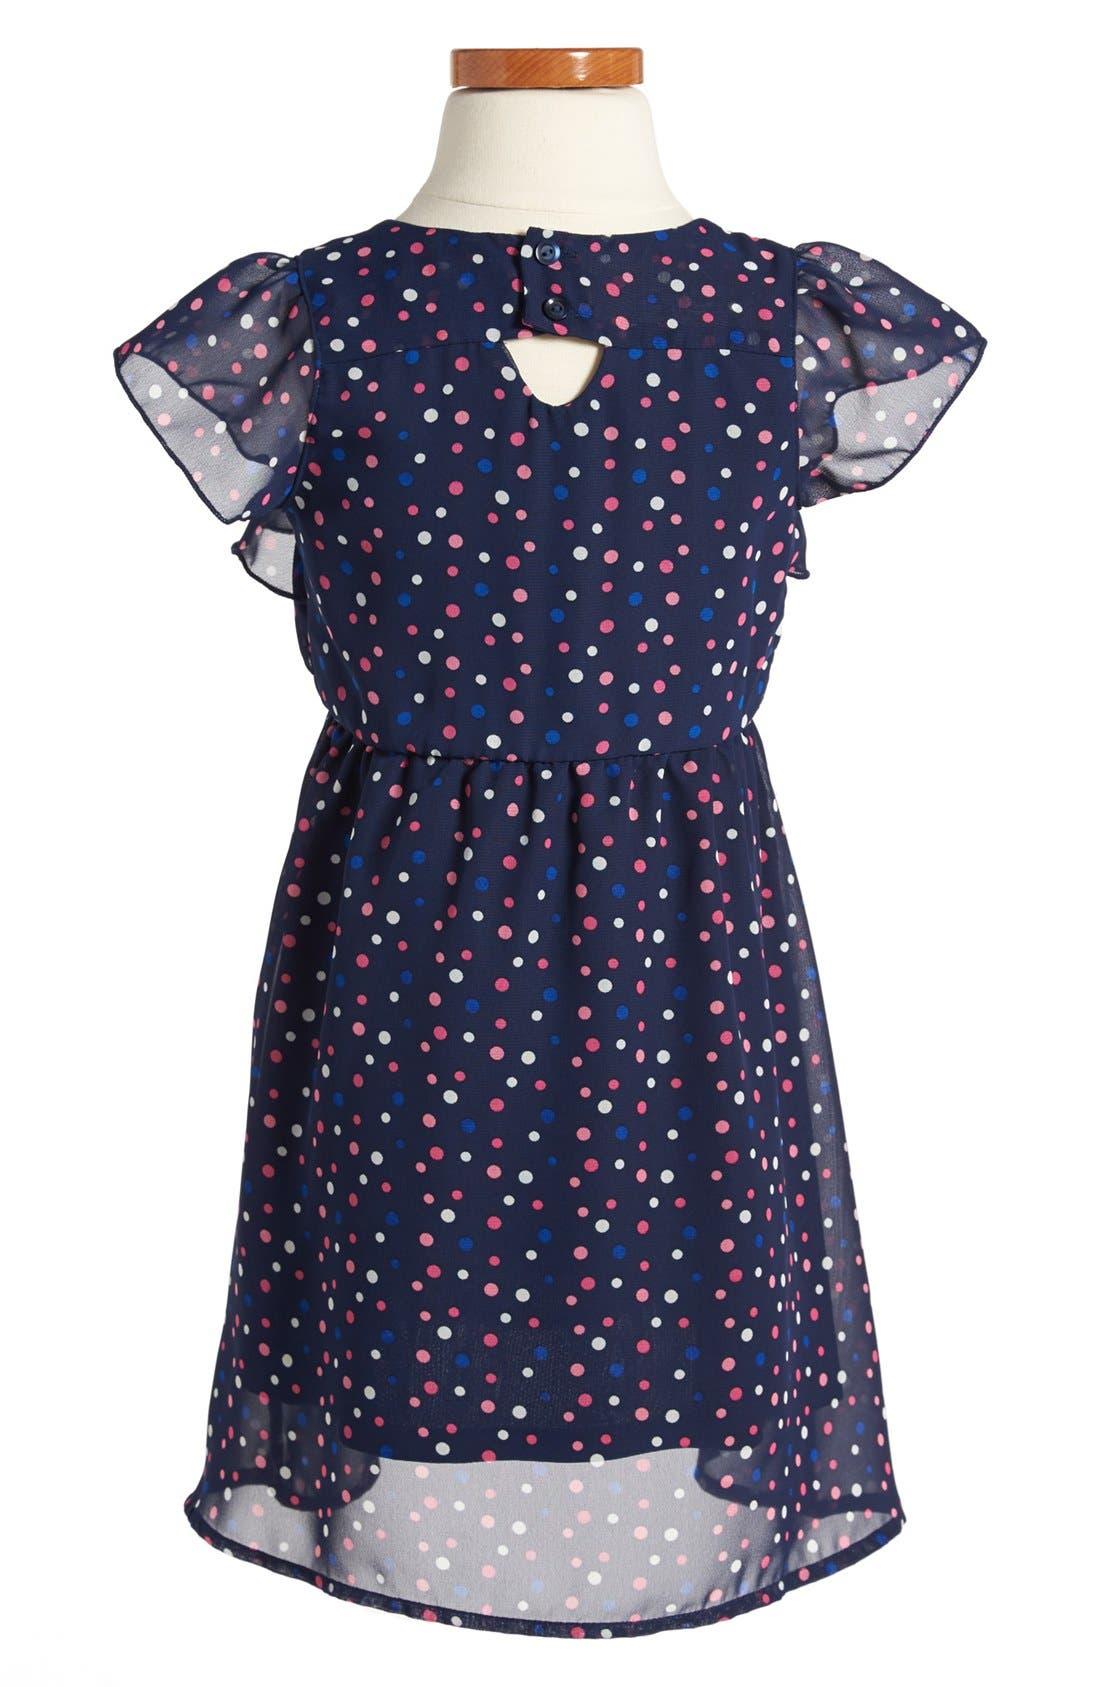 Alternate Image 2  - Weavers Polka Dot Chiffon Dress (Toddler Girls)